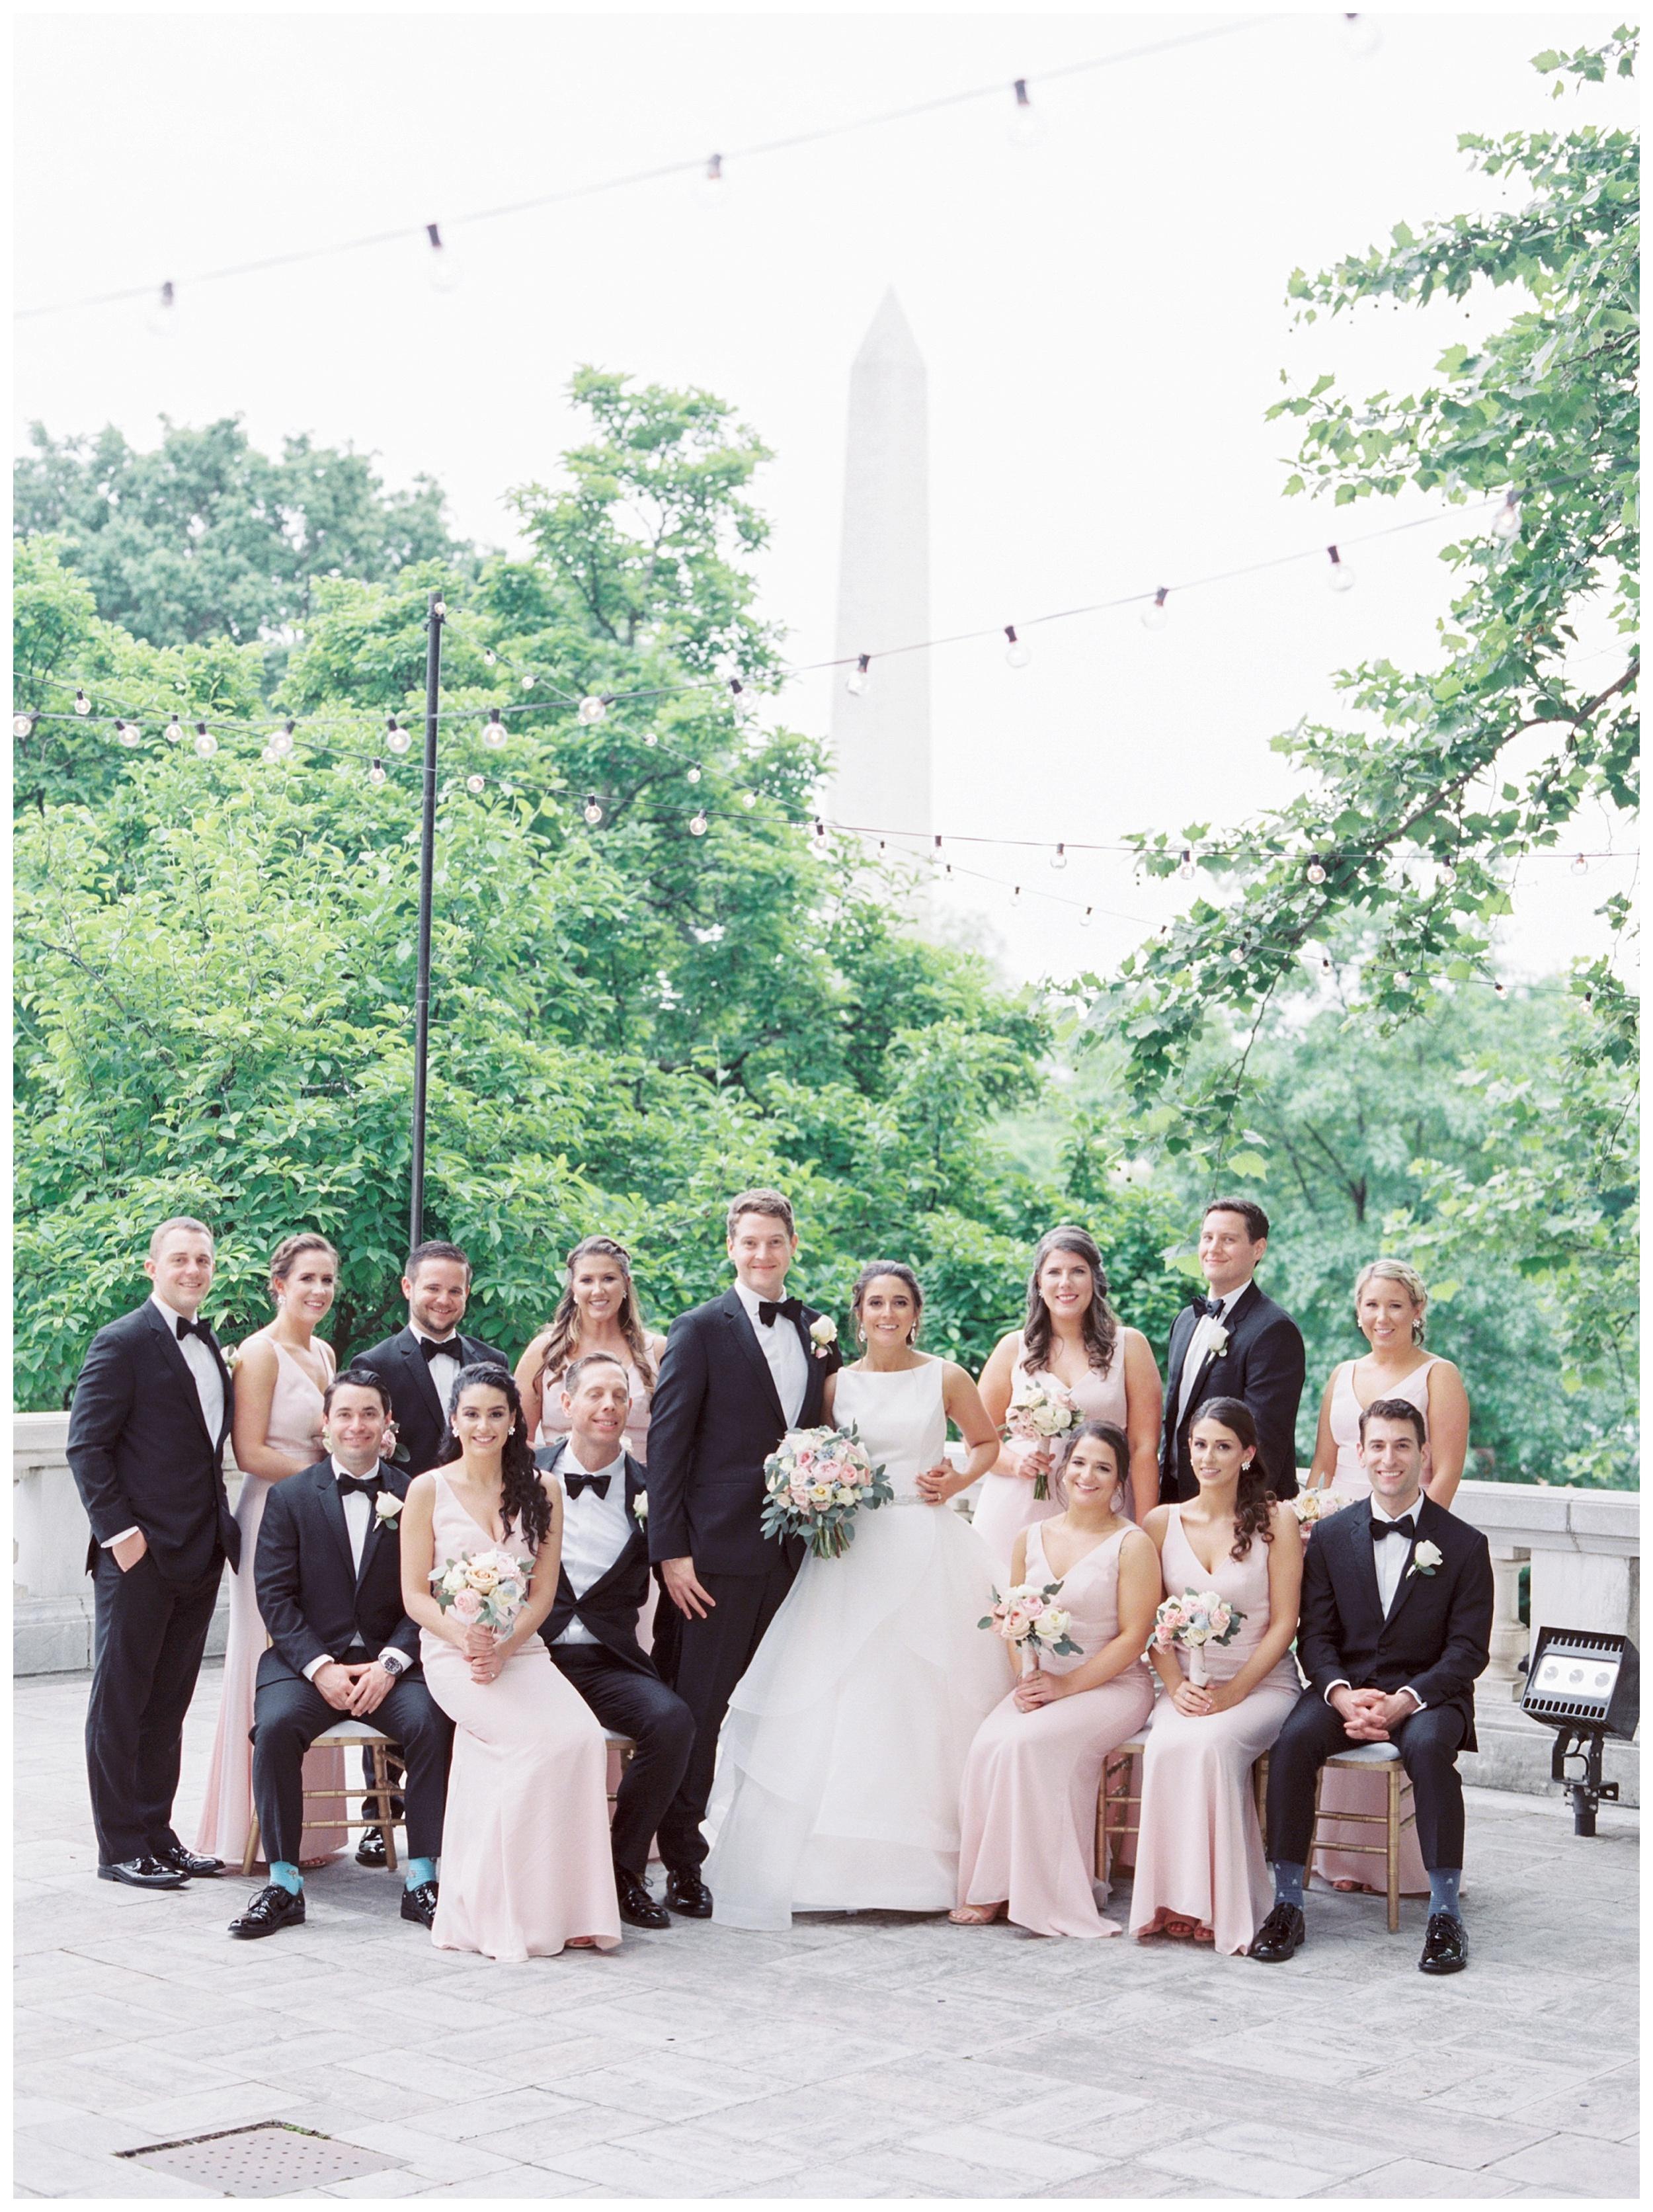 DAR Constitution Hall Wedding Wedding | Daughters of the American Revolution Wedding | District of Columbia Film Wedding Photographer Kir Tuben_0089.jpg